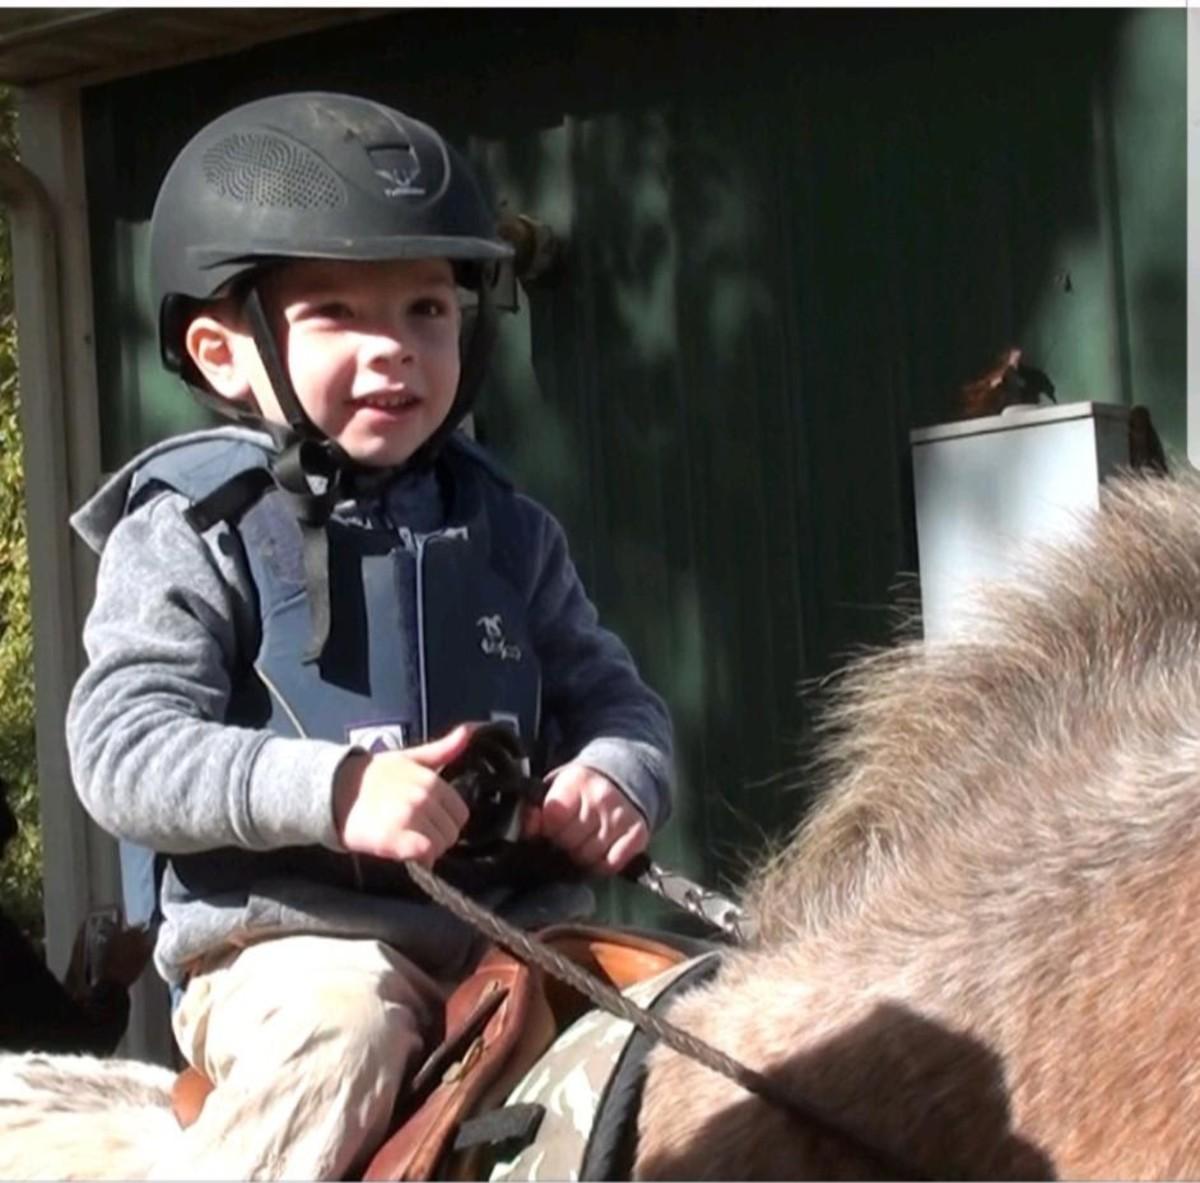 Riding Helmets 101